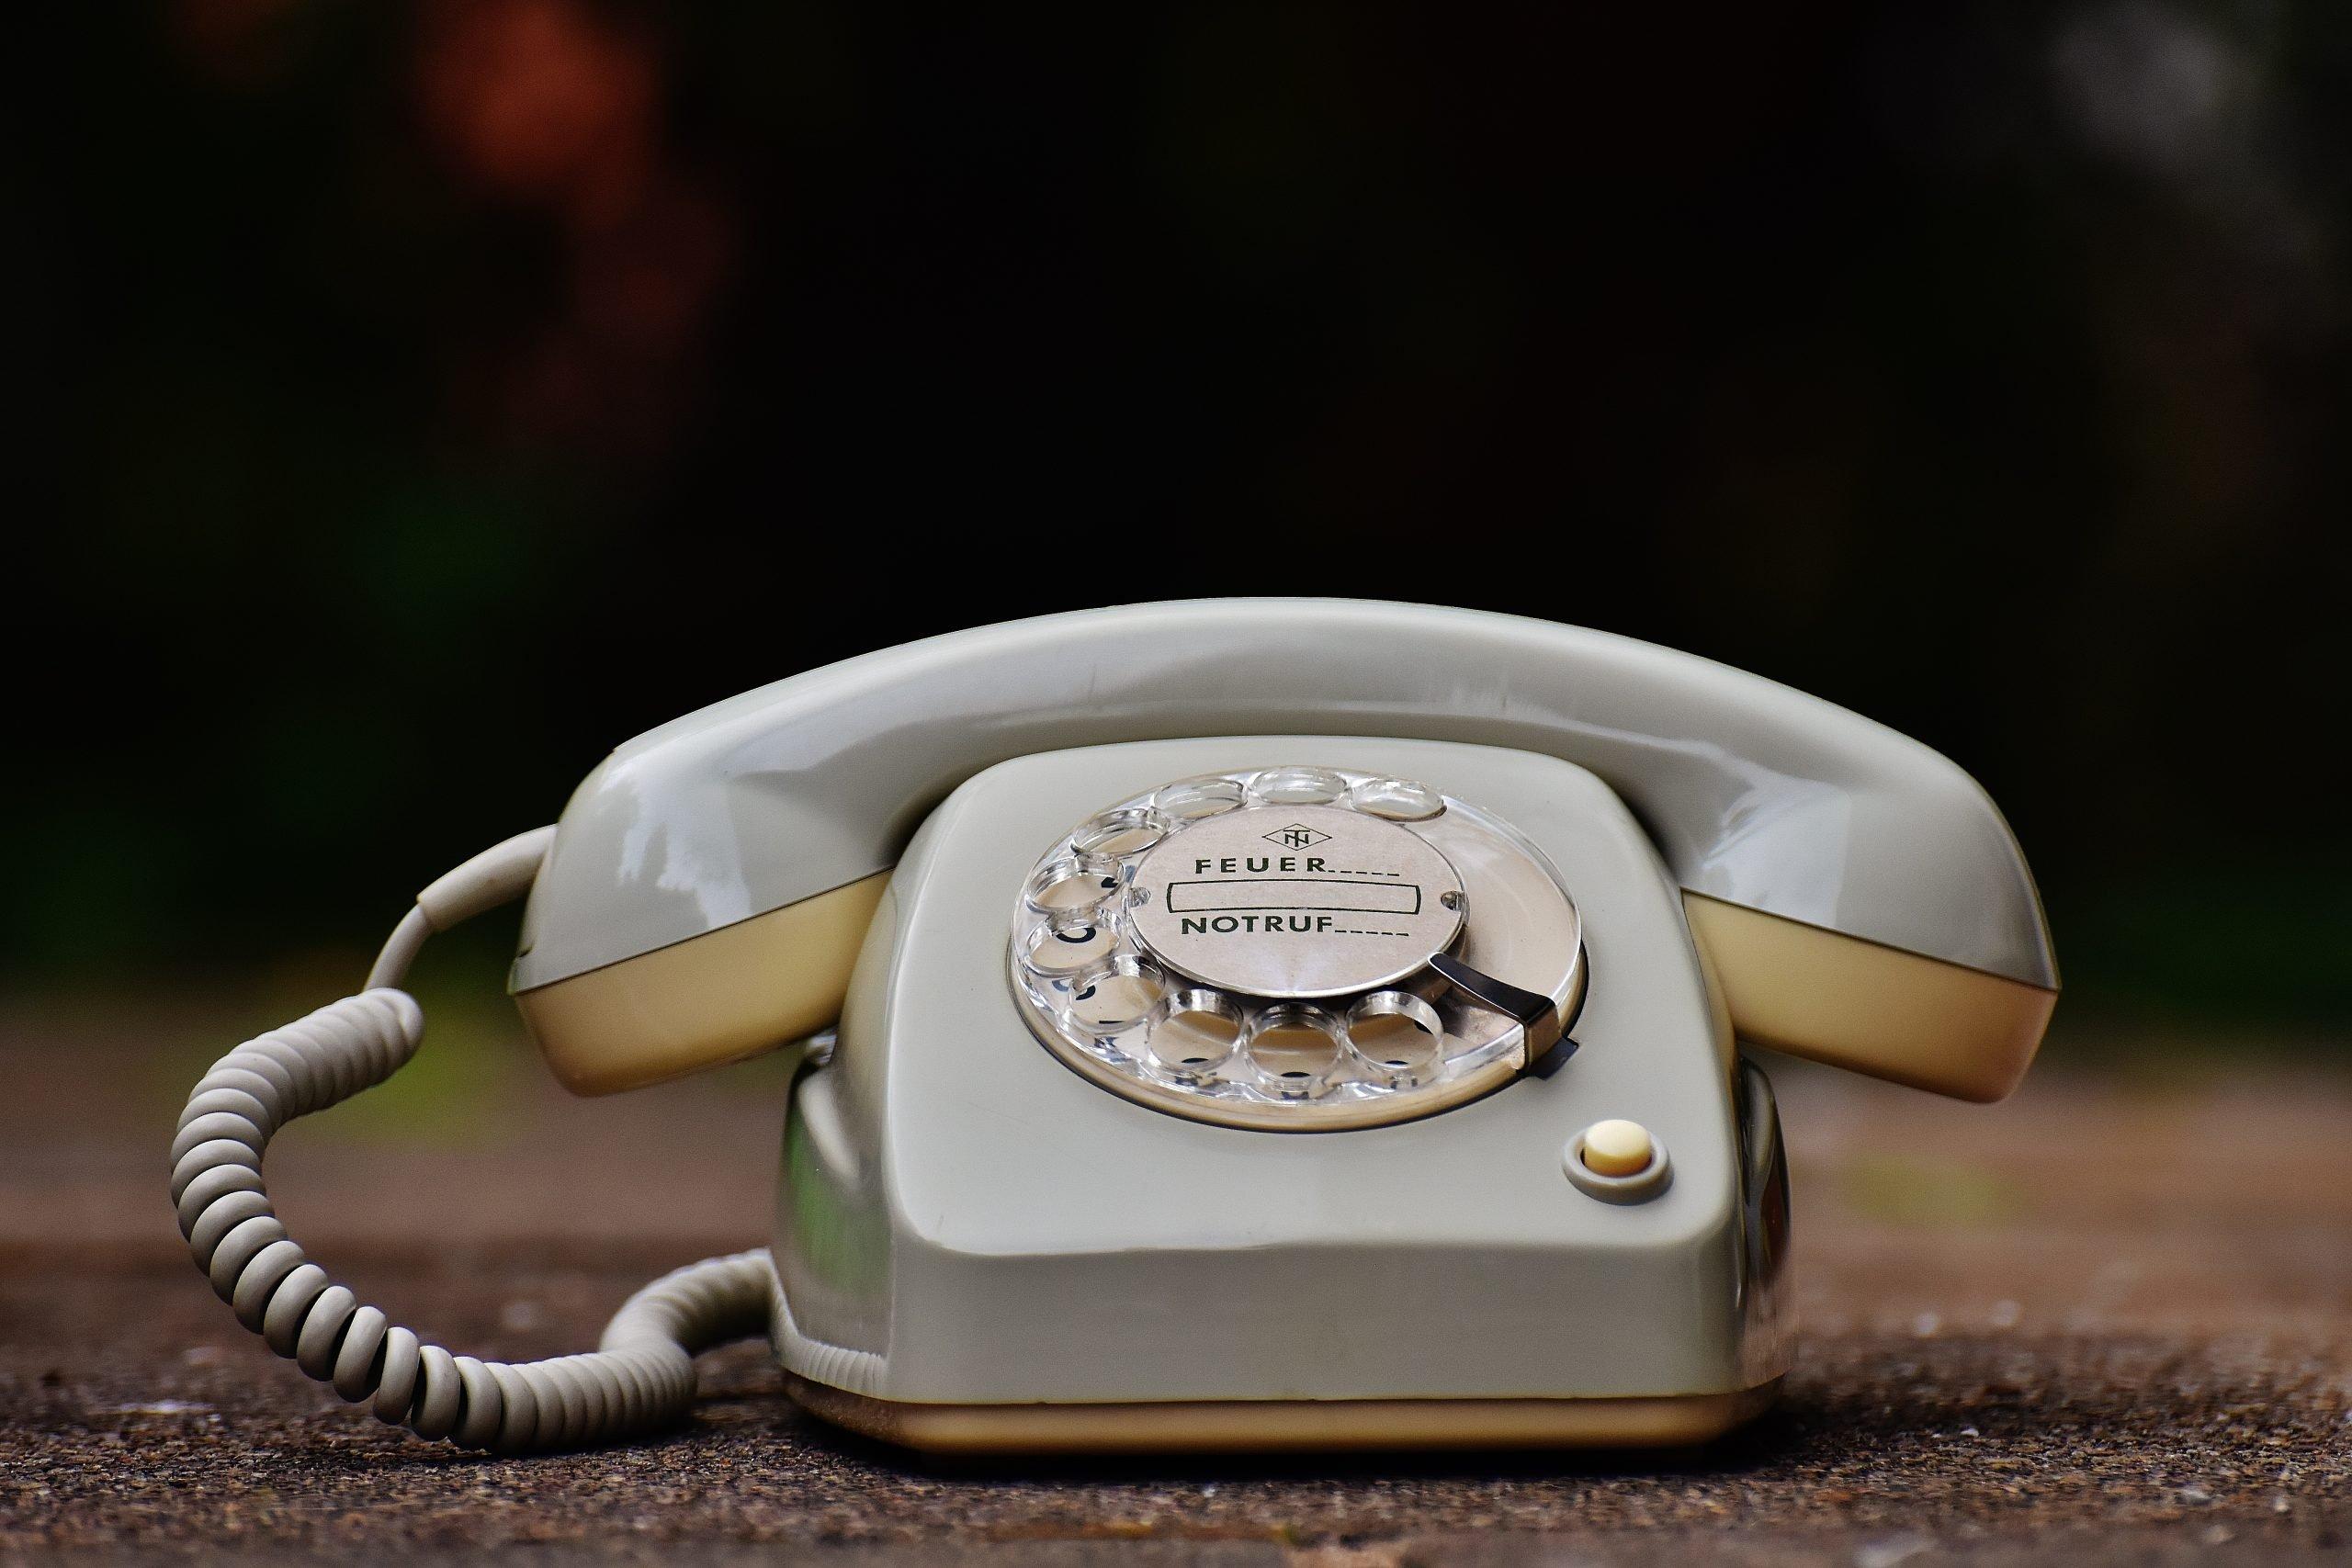 phone juliet hollingsworth